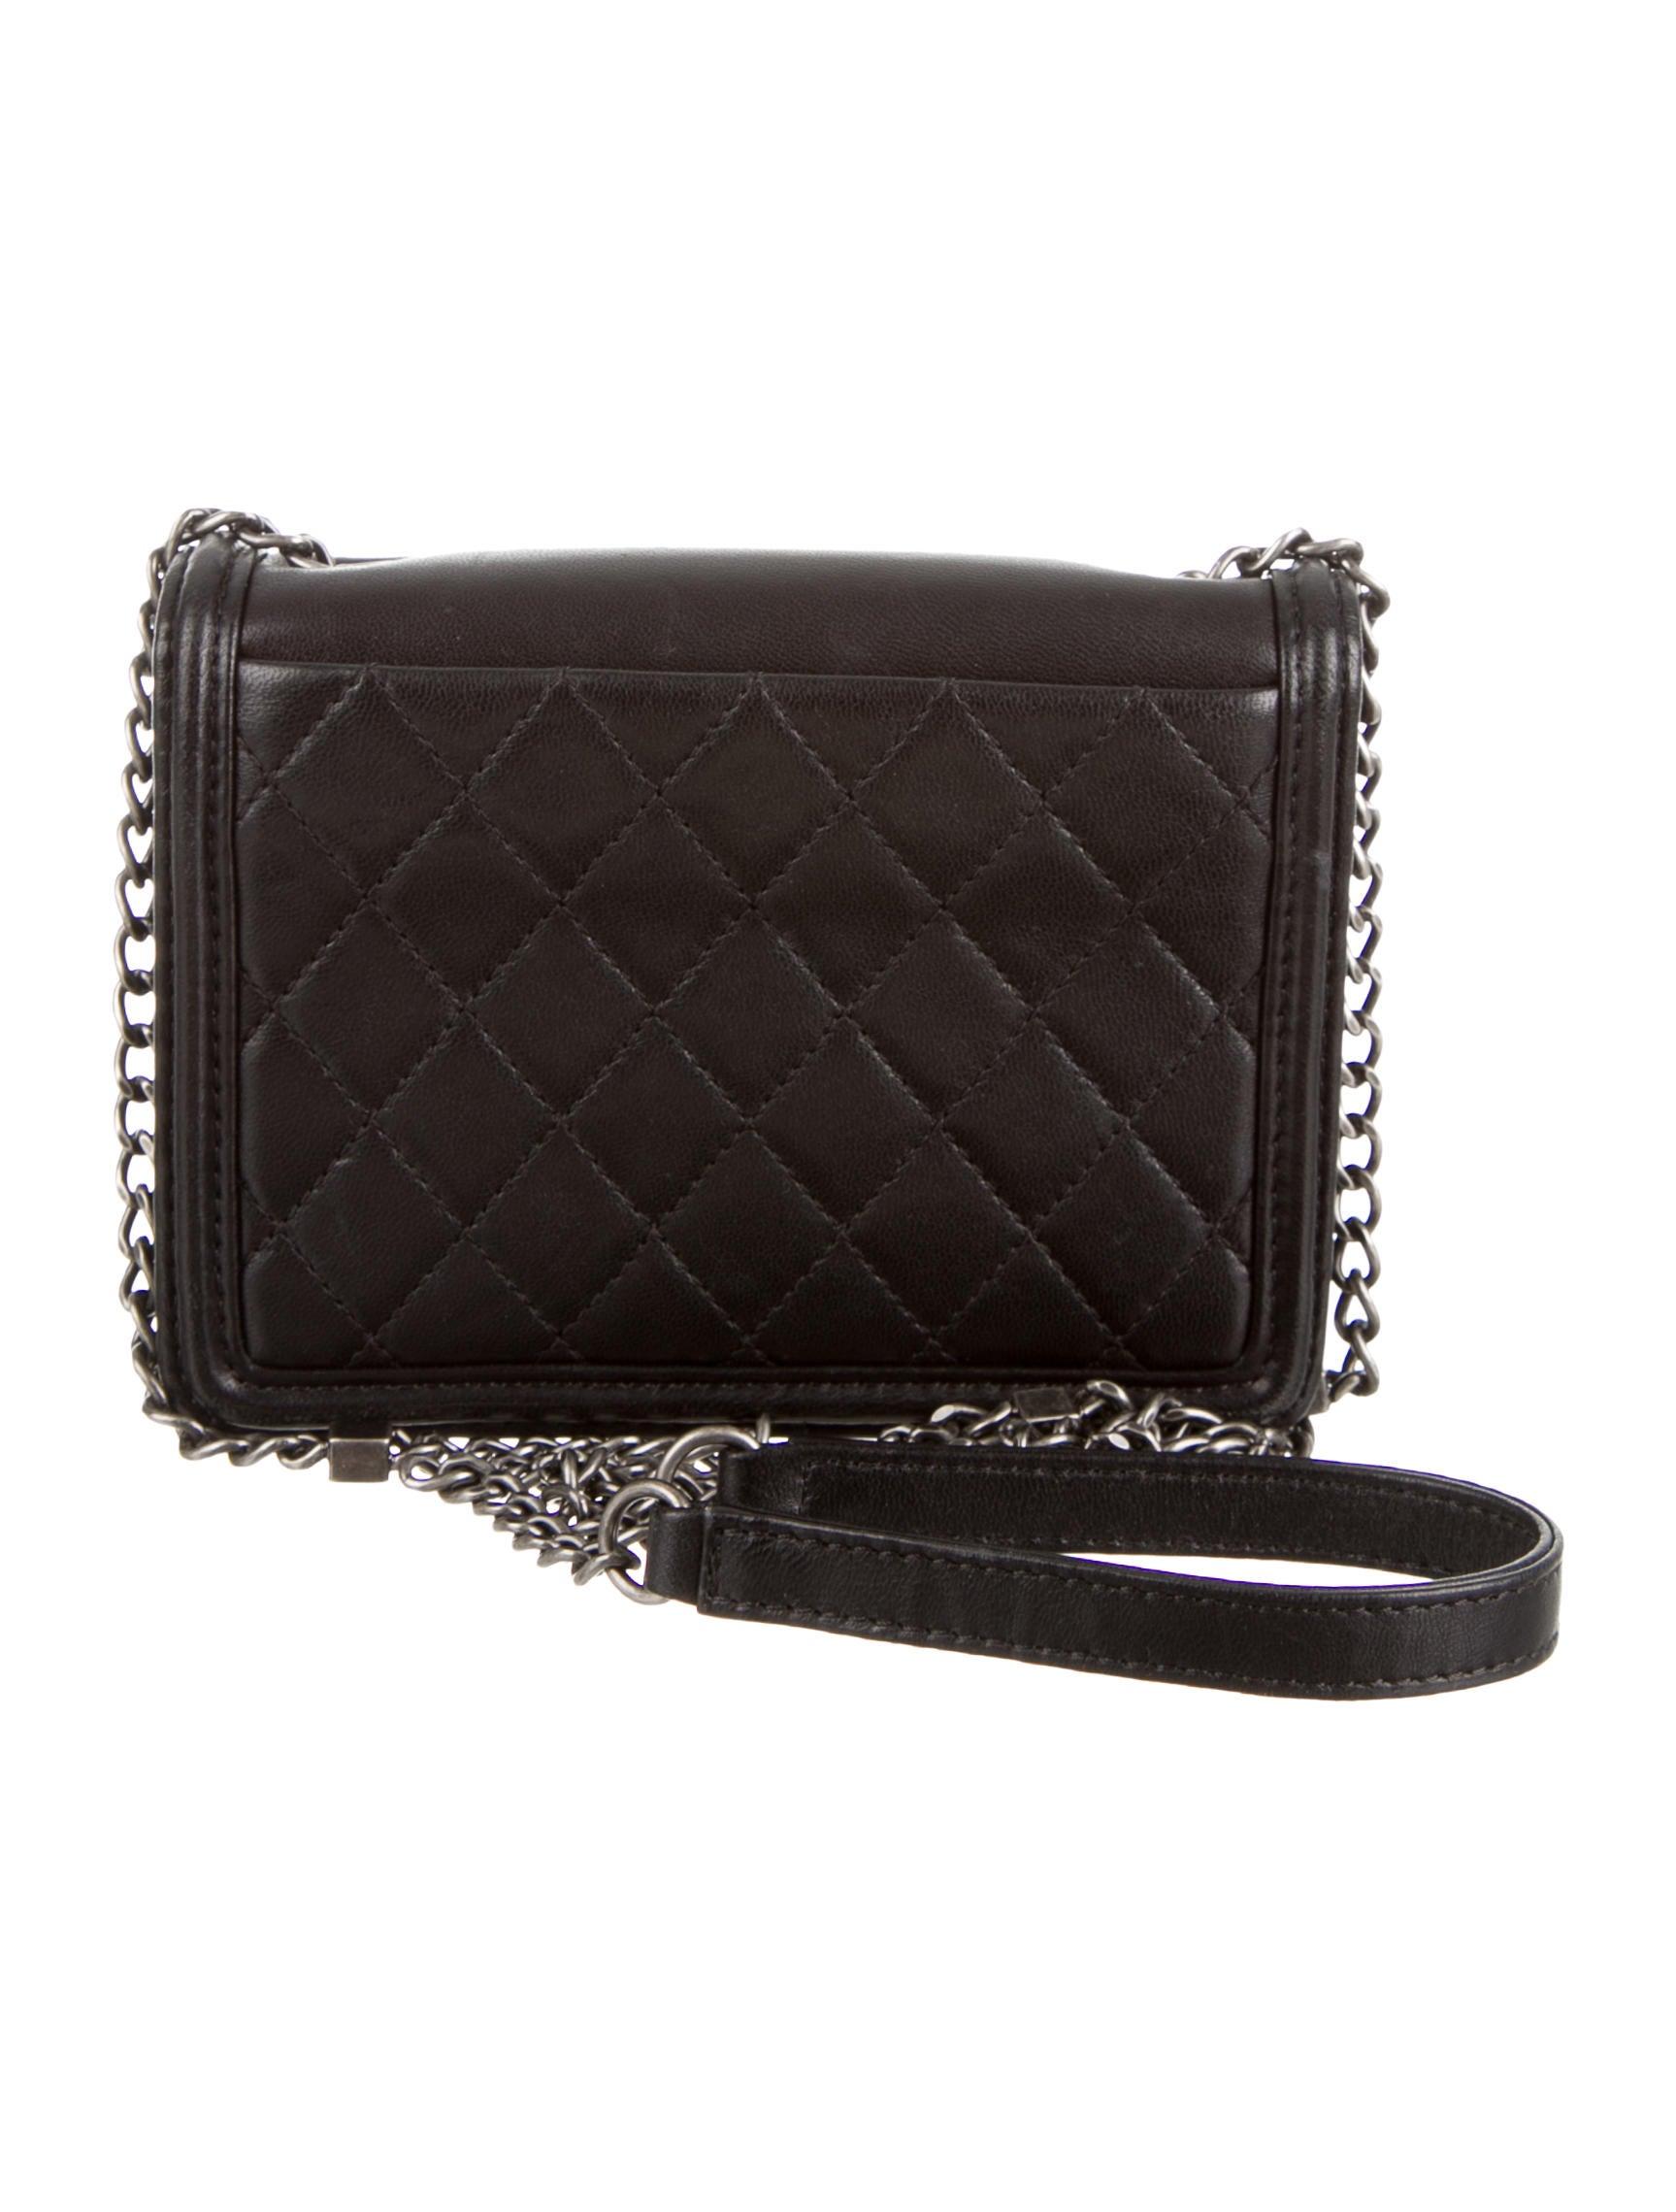 Chanel Boy Brick Flap Bag Handbags Cha83478 The Realreal